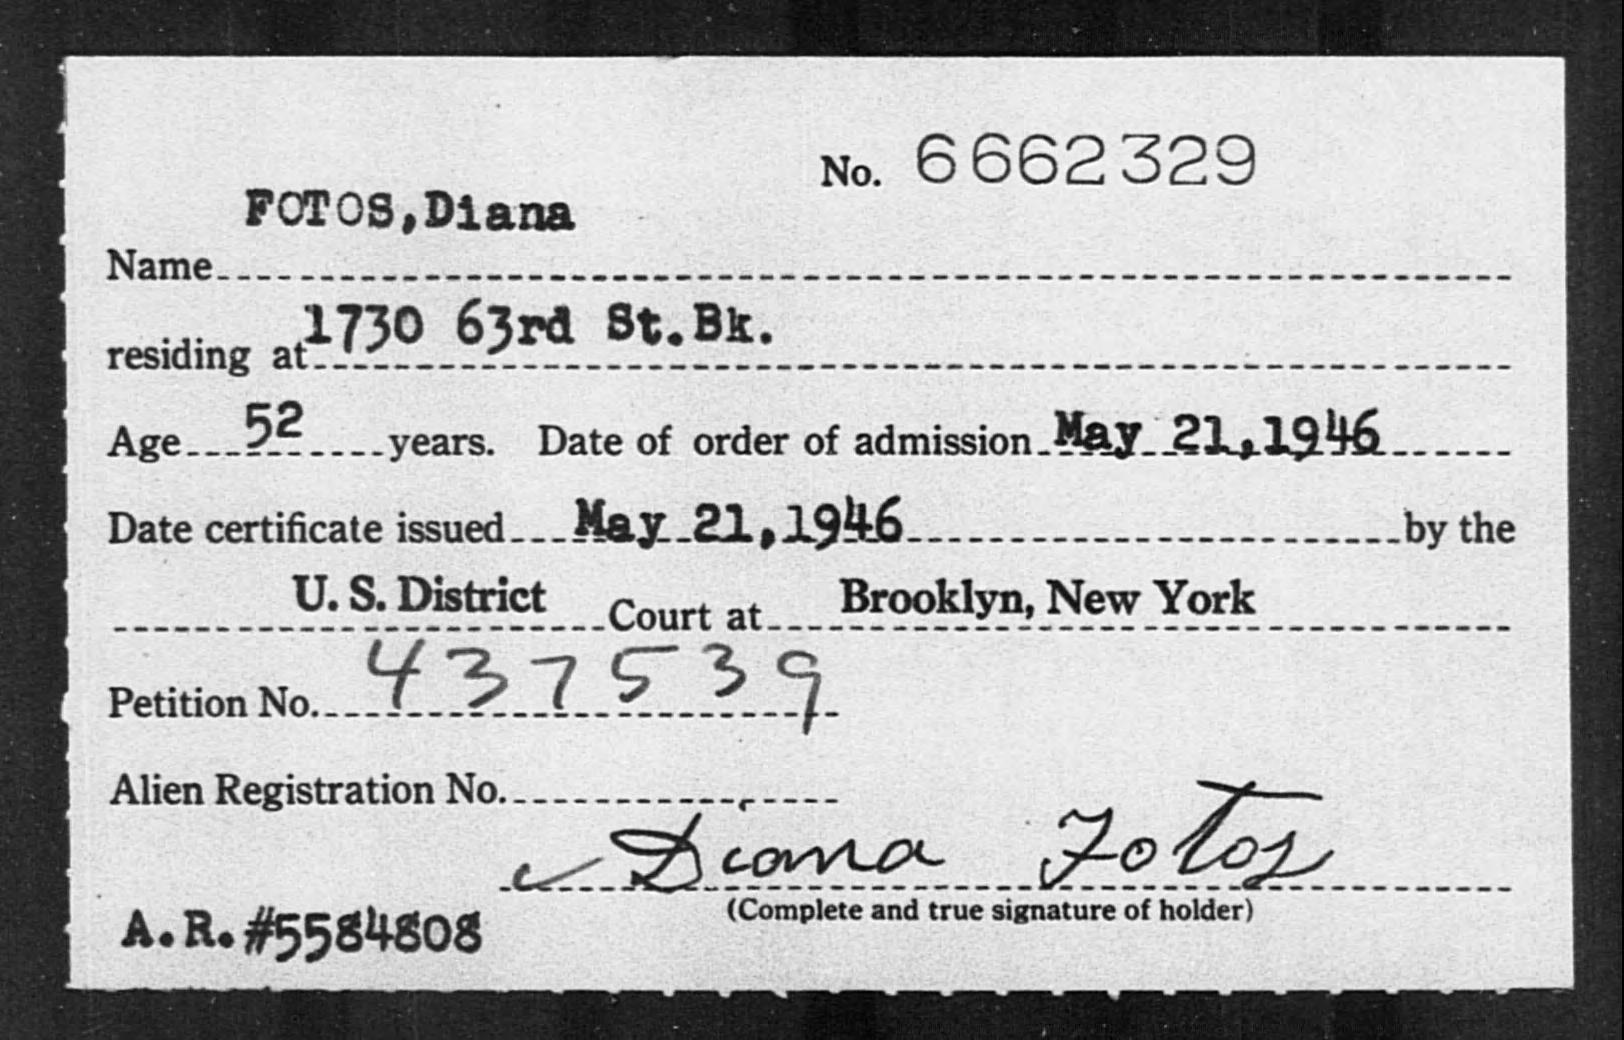 FOTOS, Diana - Born: [BLANK], Naturalized: 1946